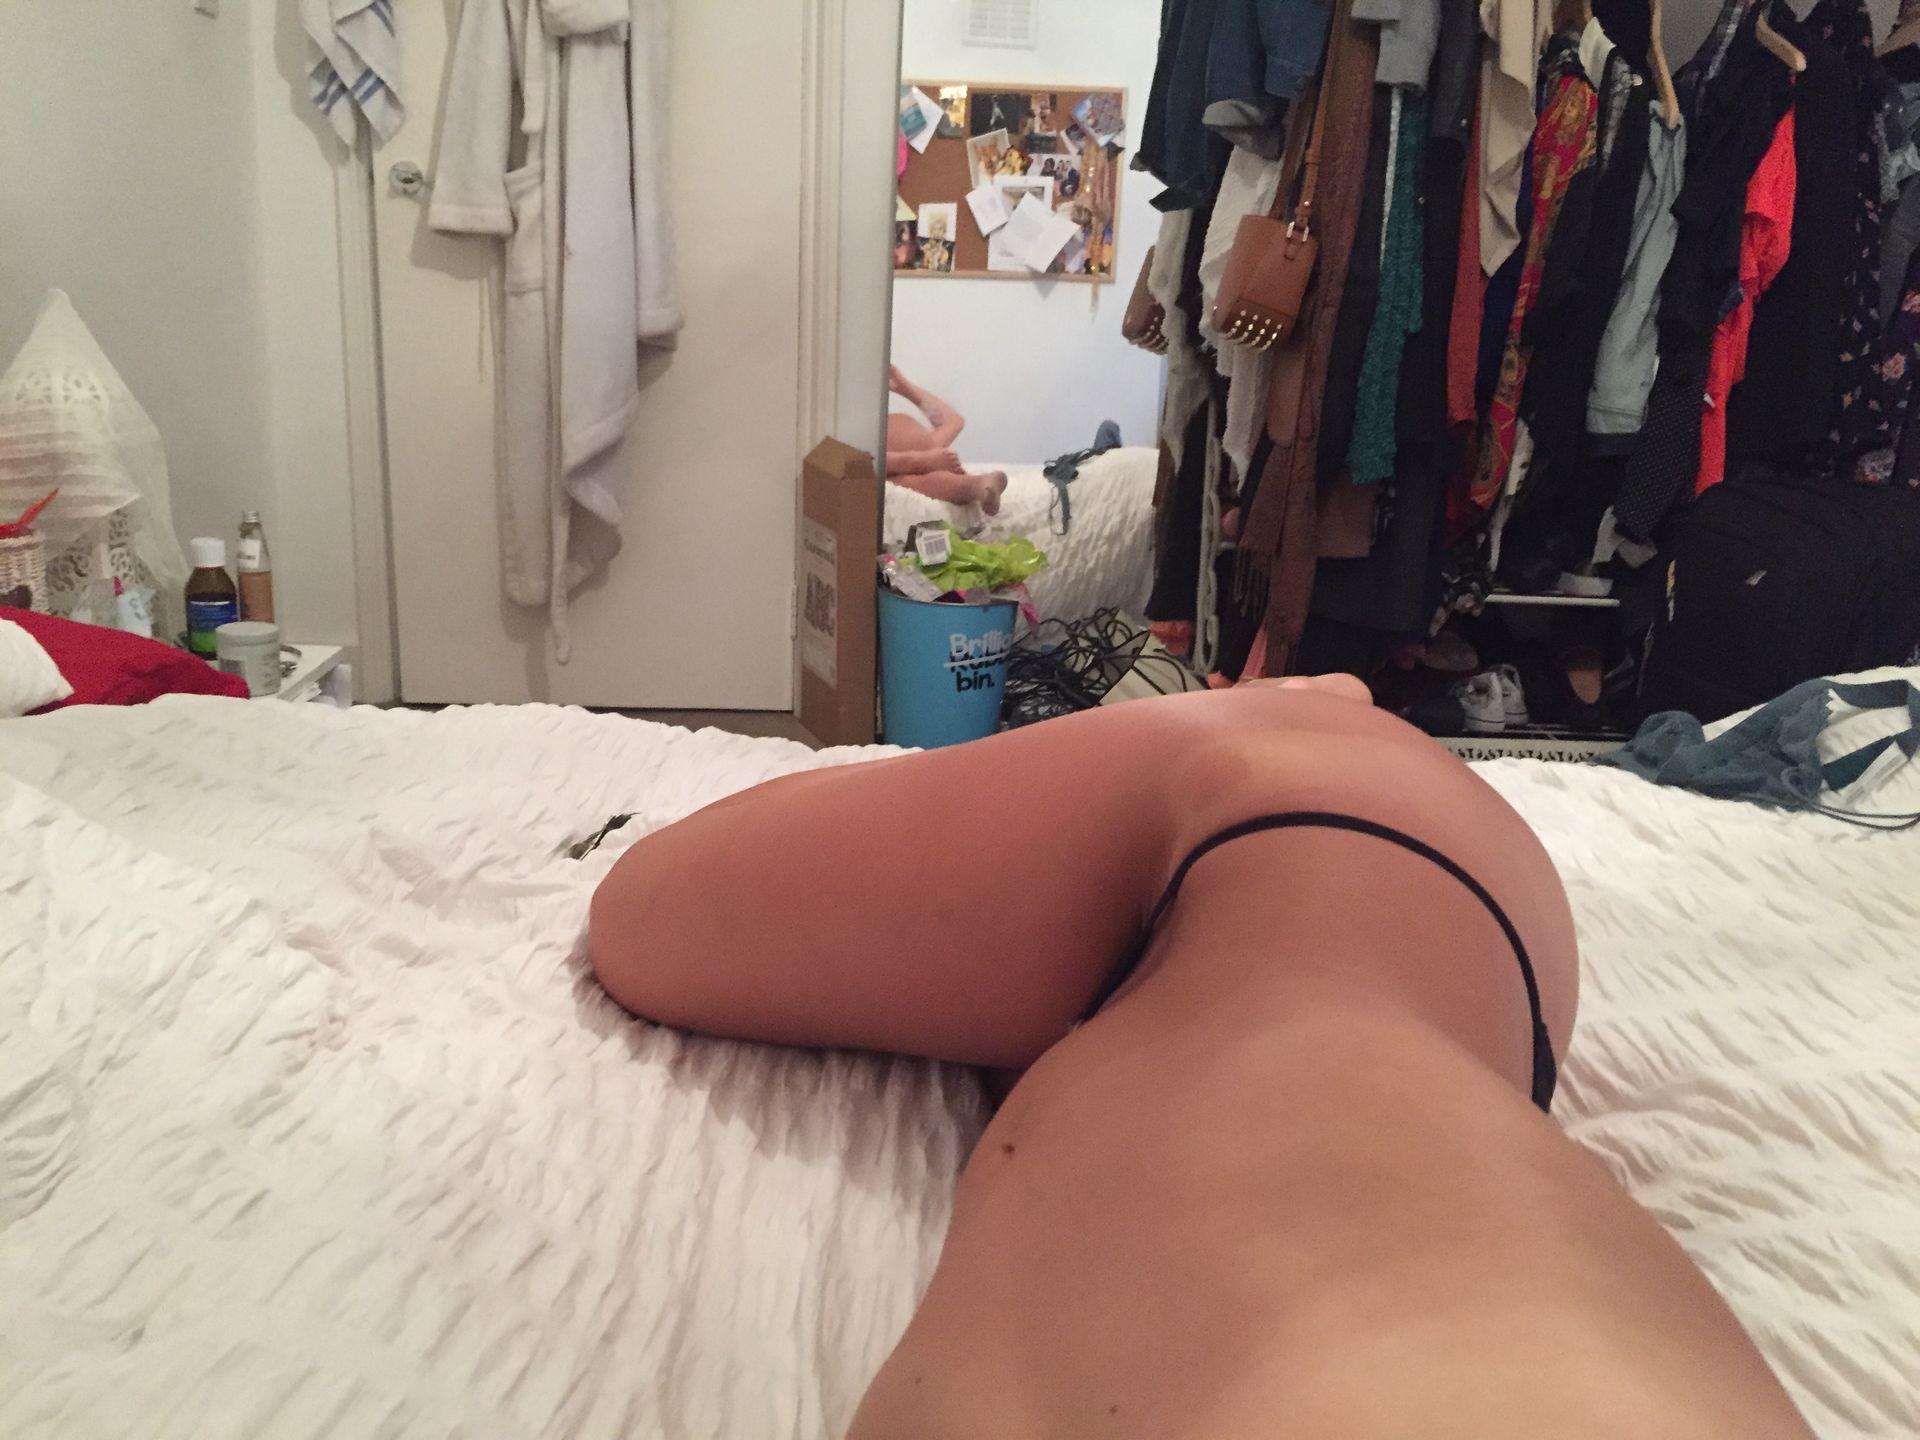 Zizi Strallen Nude Leaked The Fappening 0023